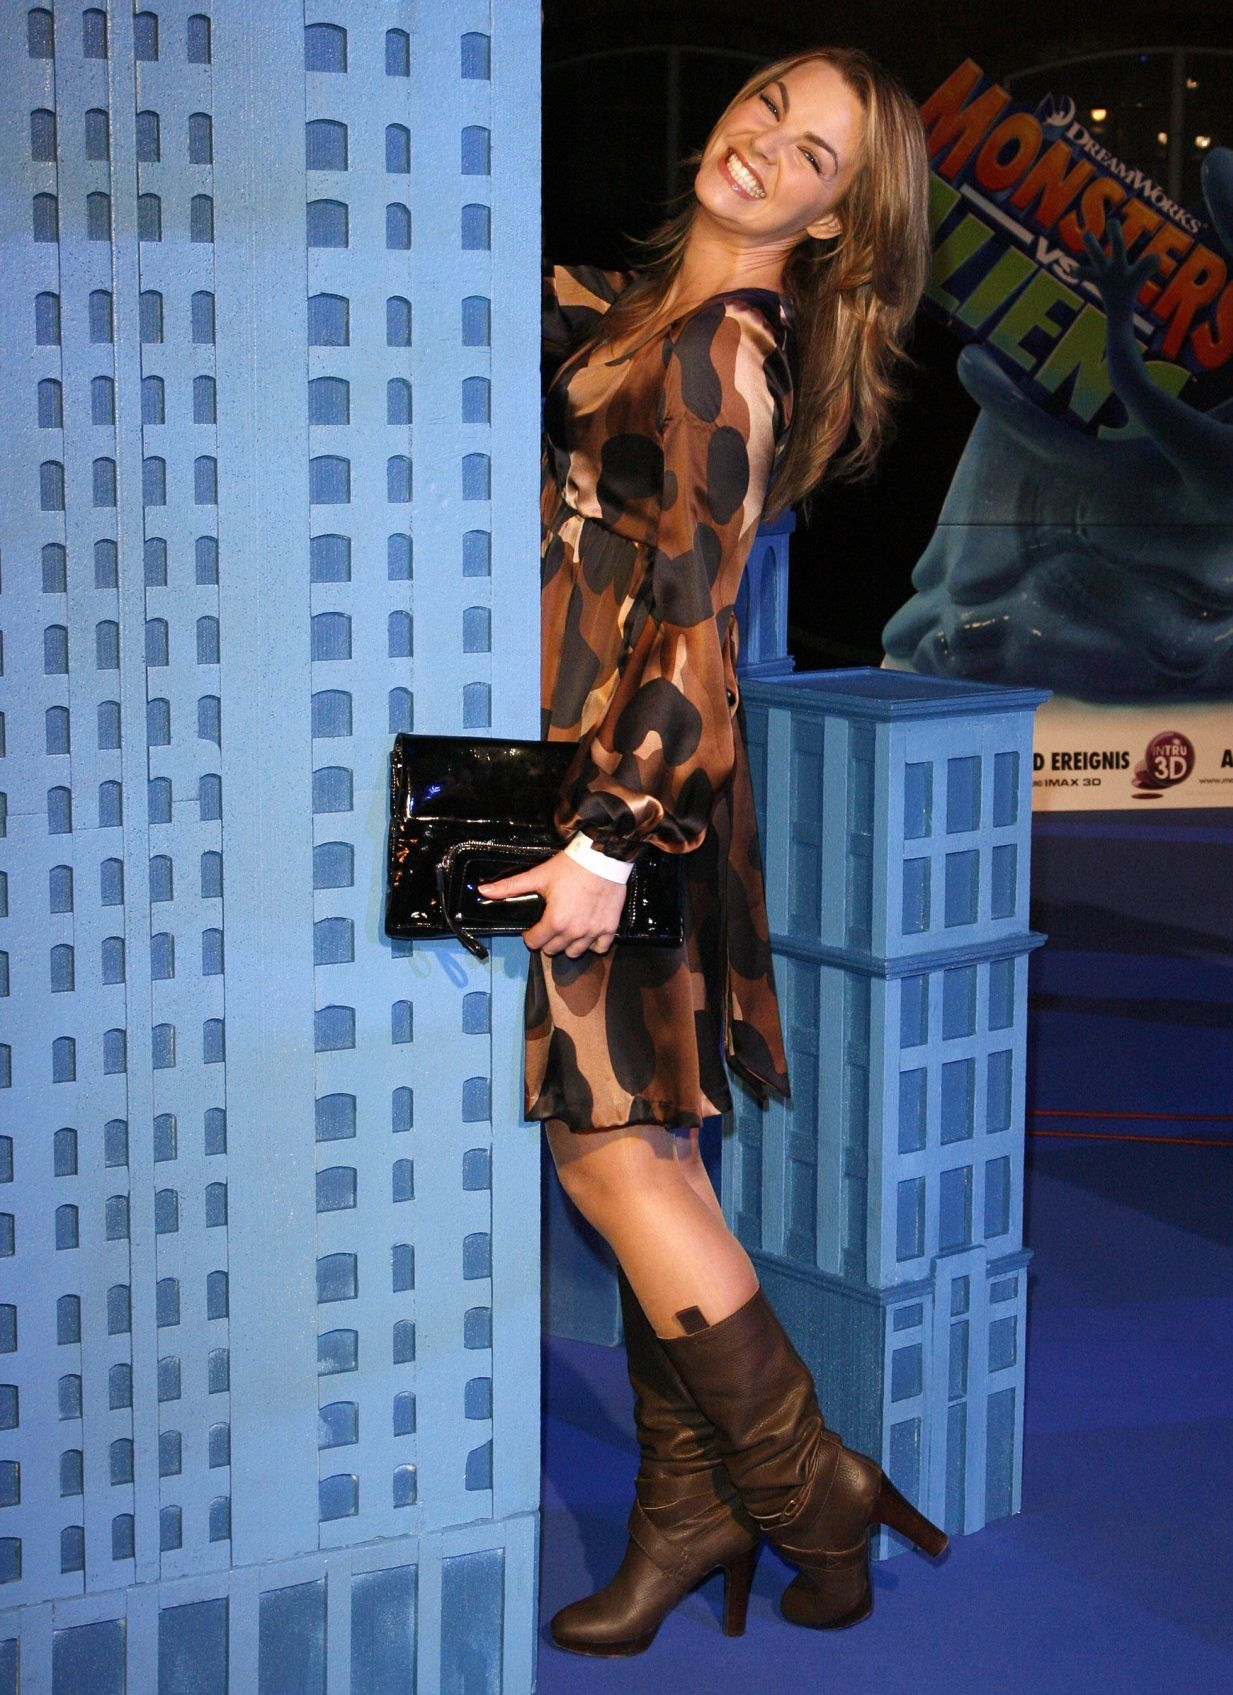 Annika Kipp in shiny tights